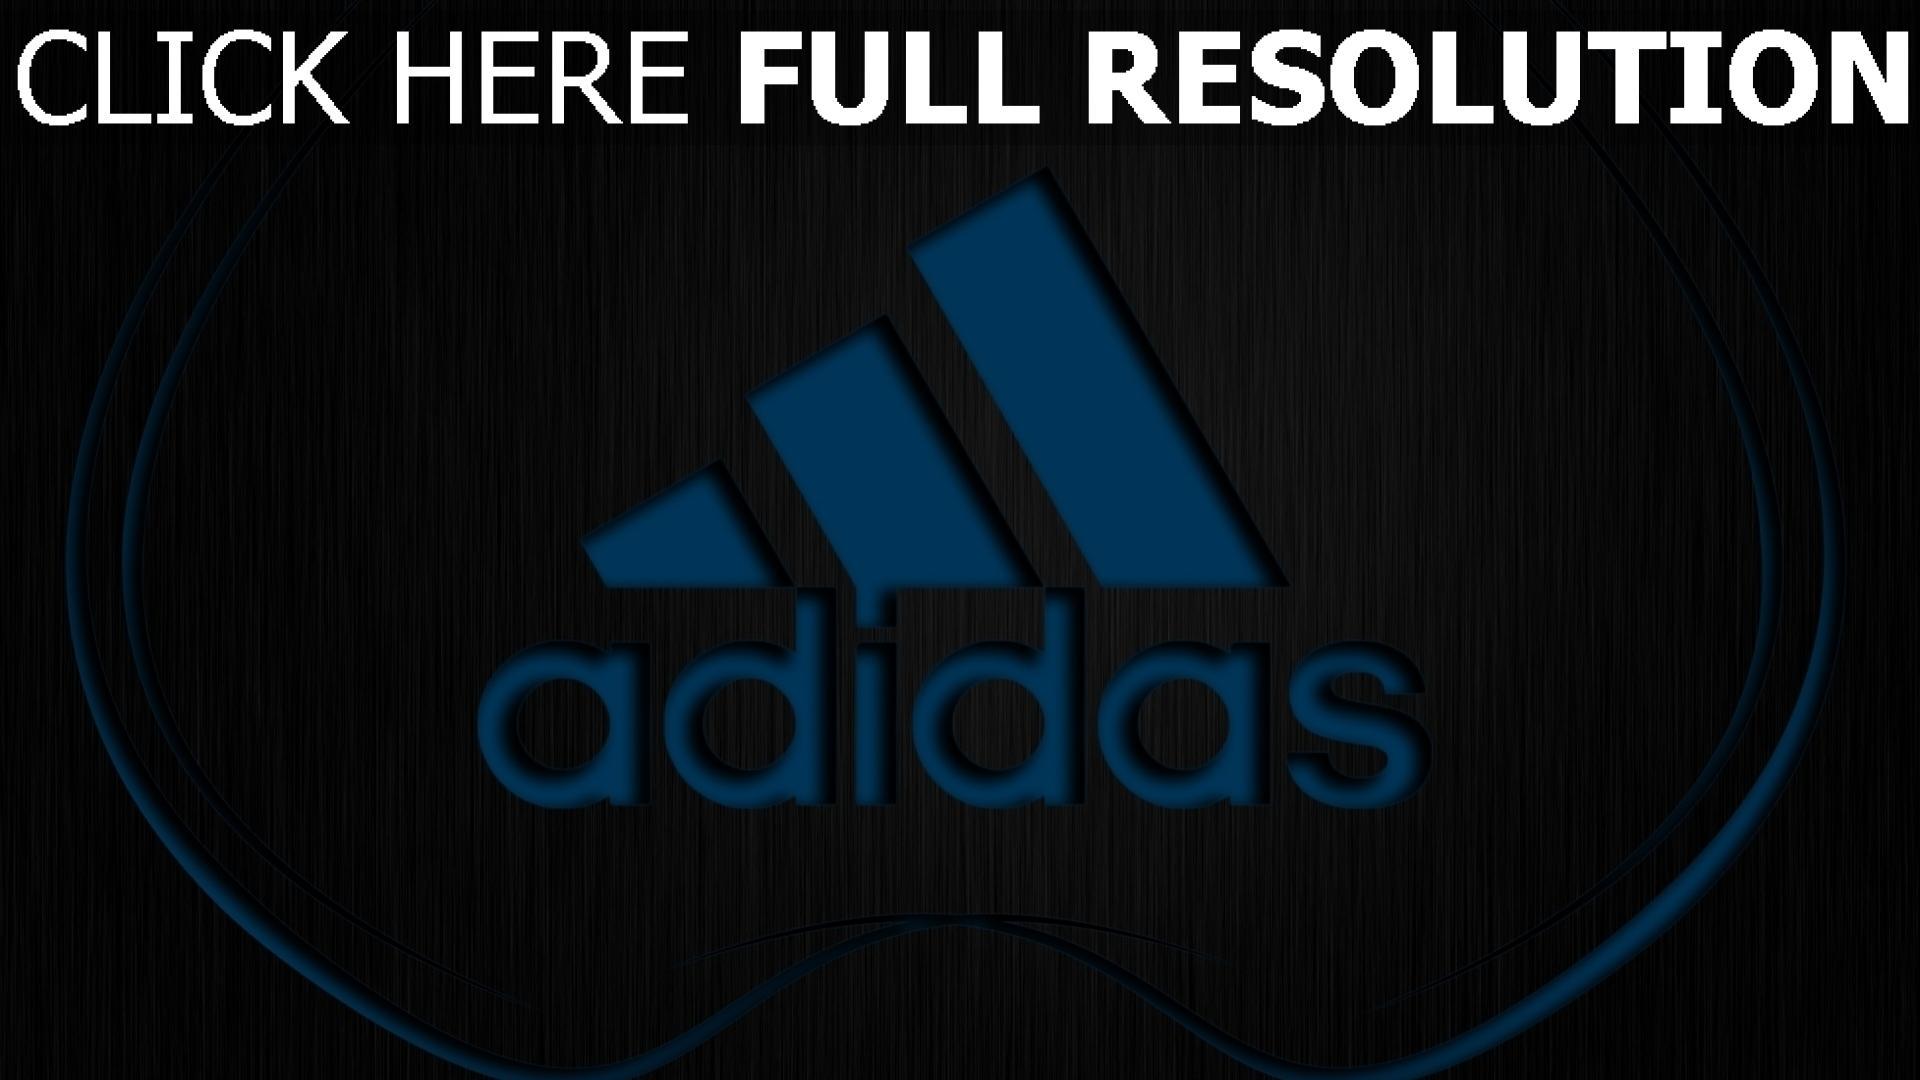 hd hintergrundbilder adidas logo blau oberfläche textur 1920x1080